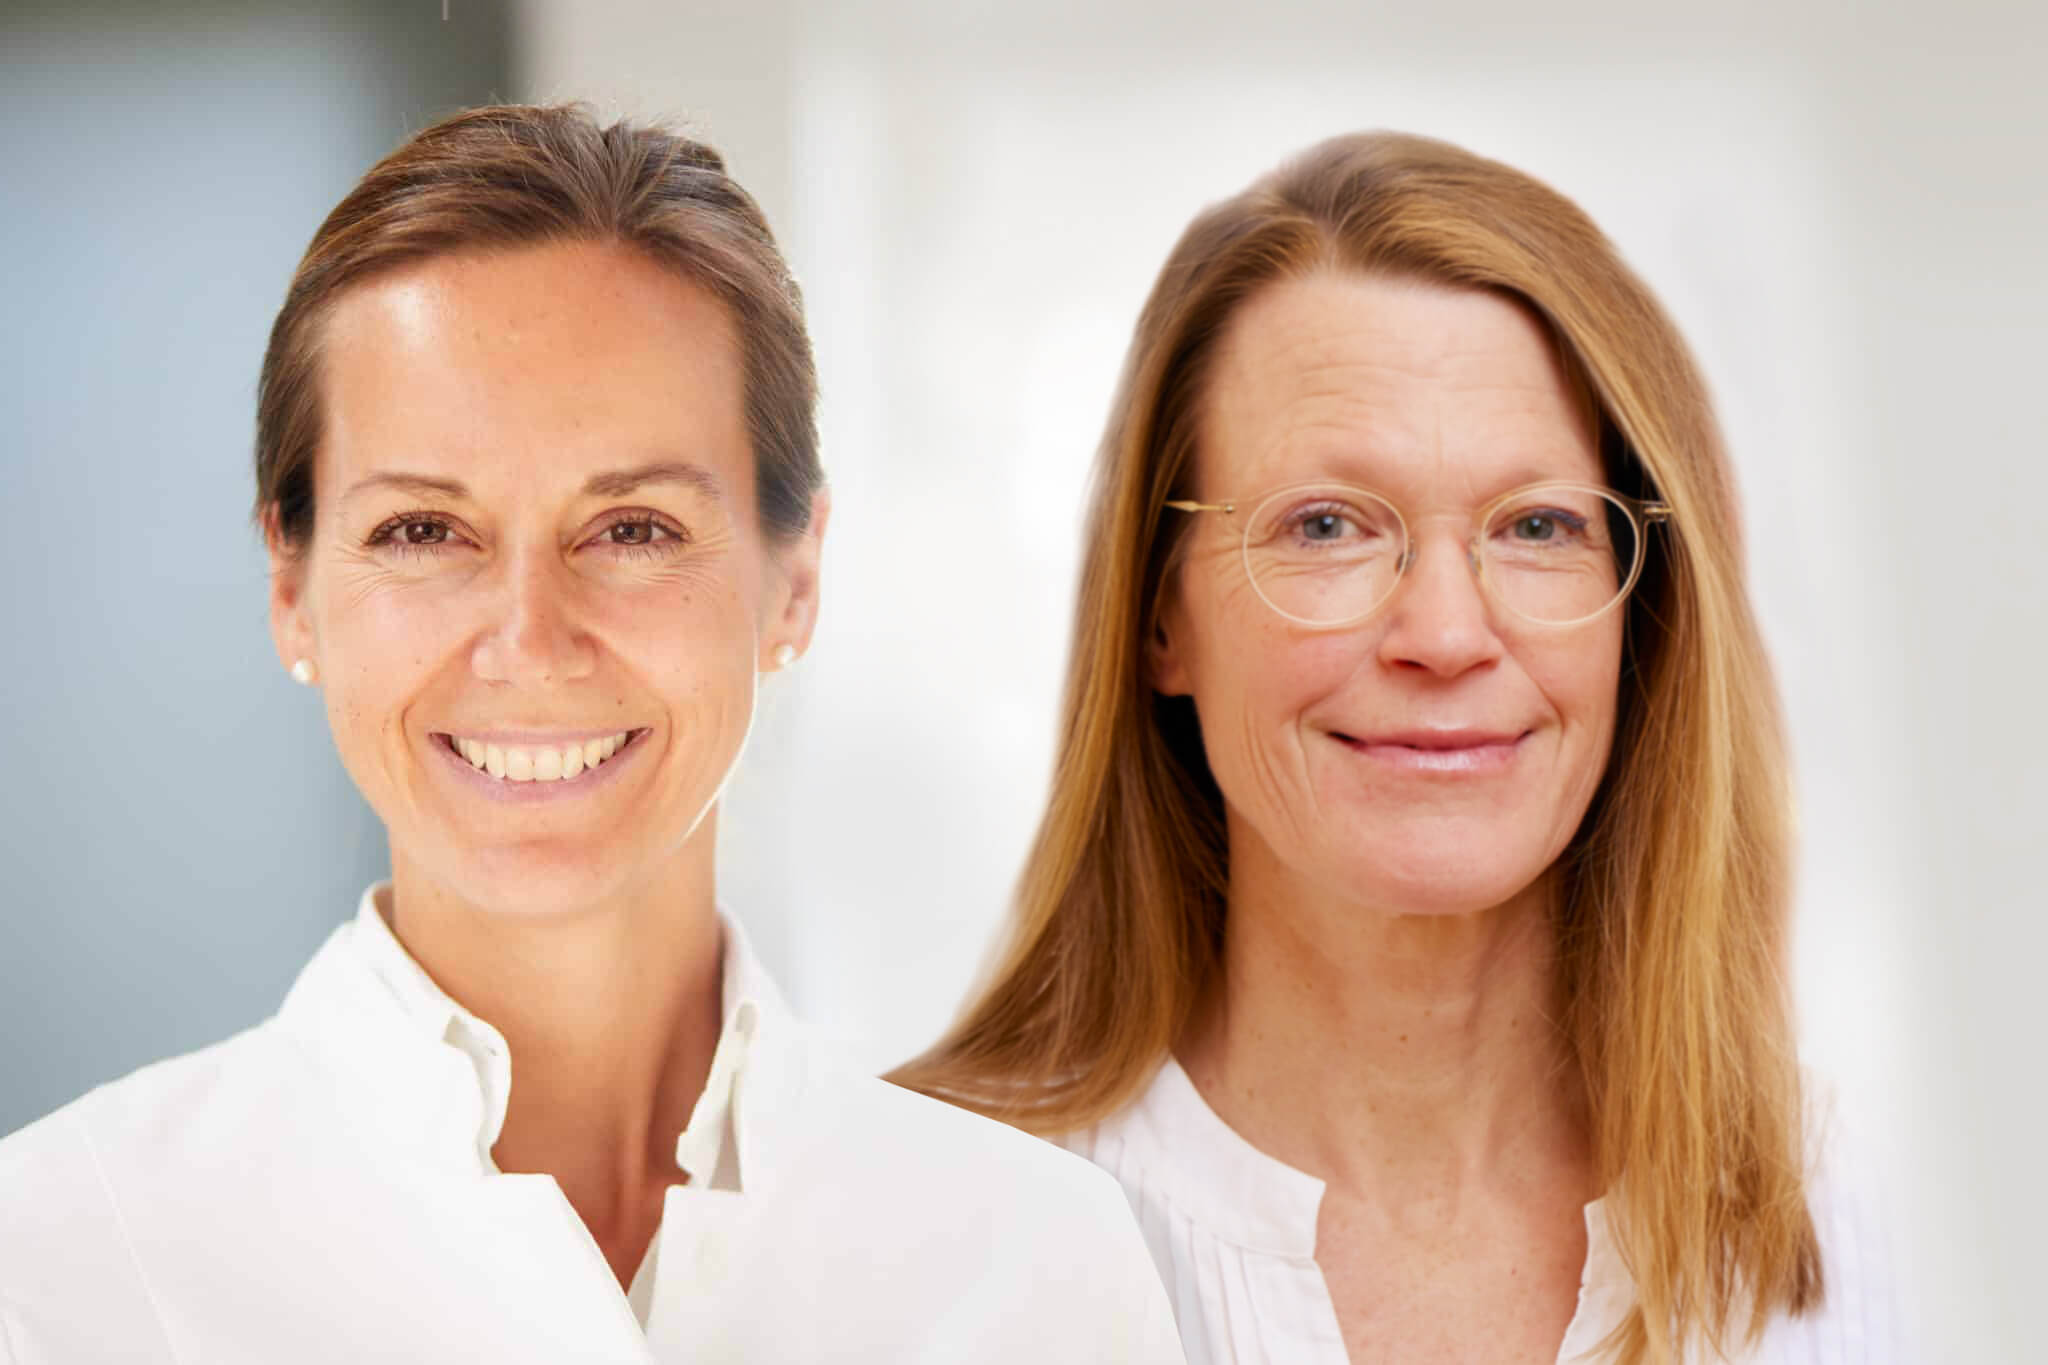 Frau Dr. med. Corinna Mann und Frau Dr. med. Anja Albrecht